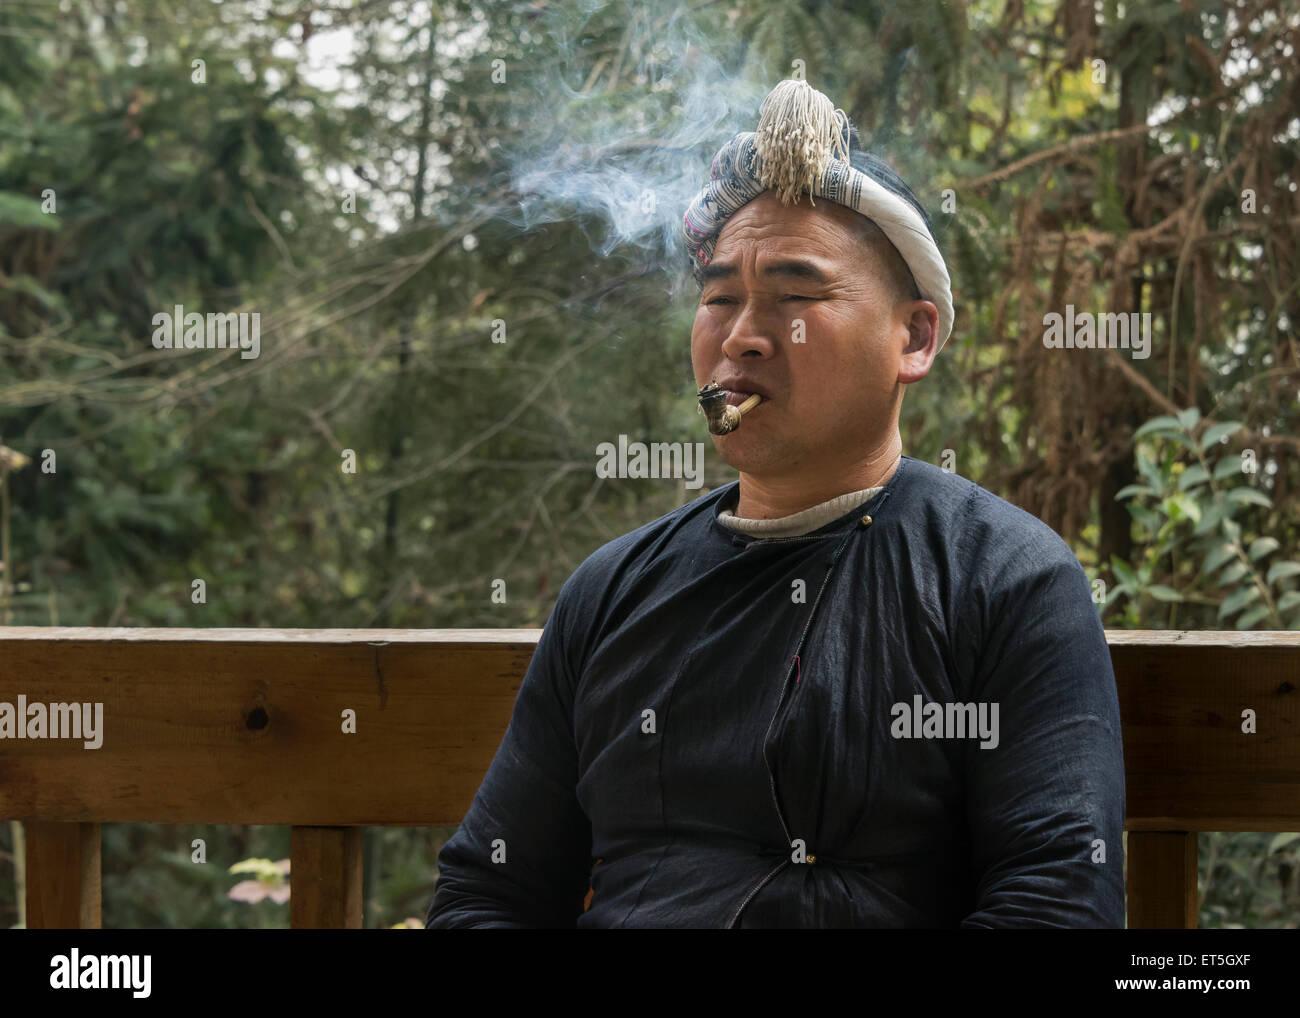 Basha Miao man smoking a pipe, Basha Gun Village, Guizhou Province, China - Stock Image